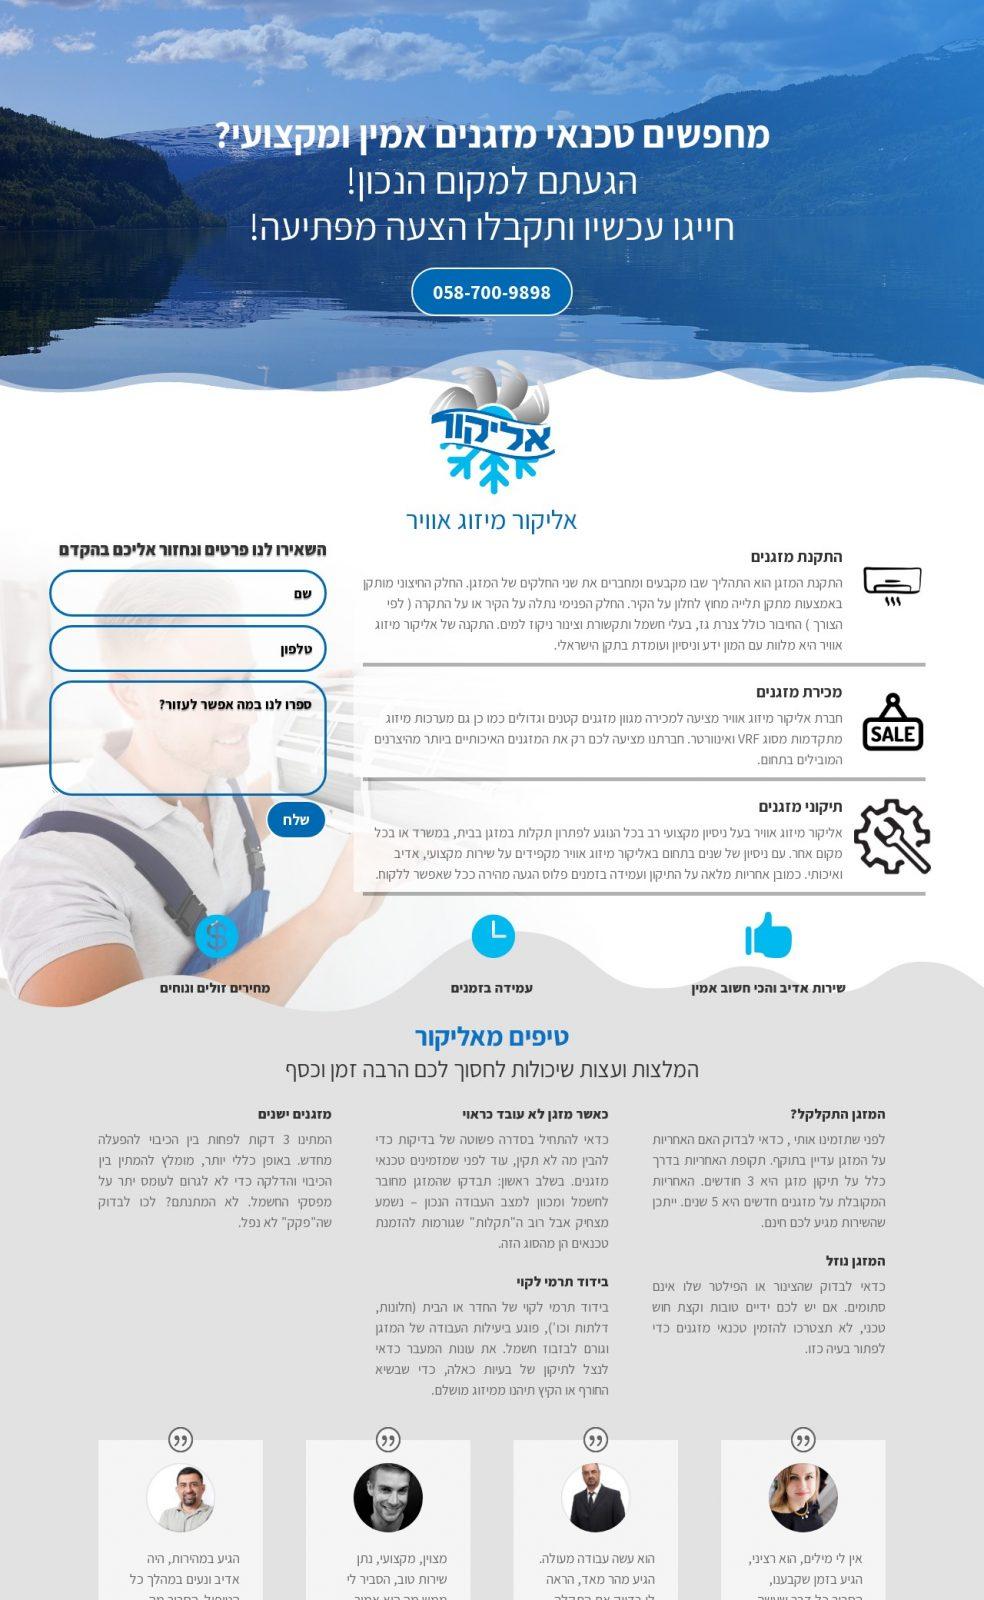 אליקור טכנאי מזגנים - MXpage